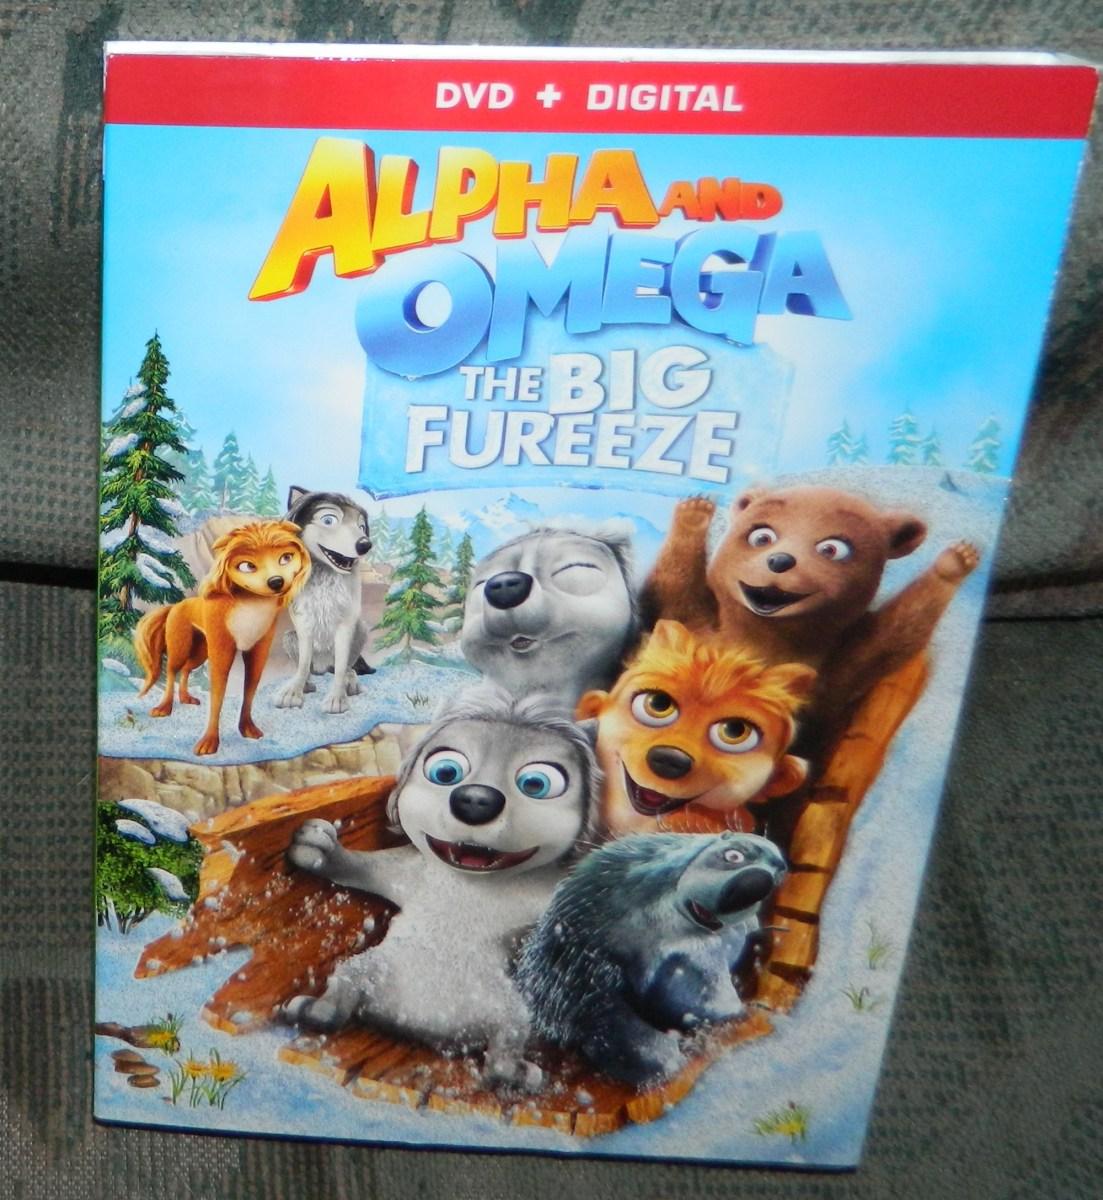 DVD + Digital